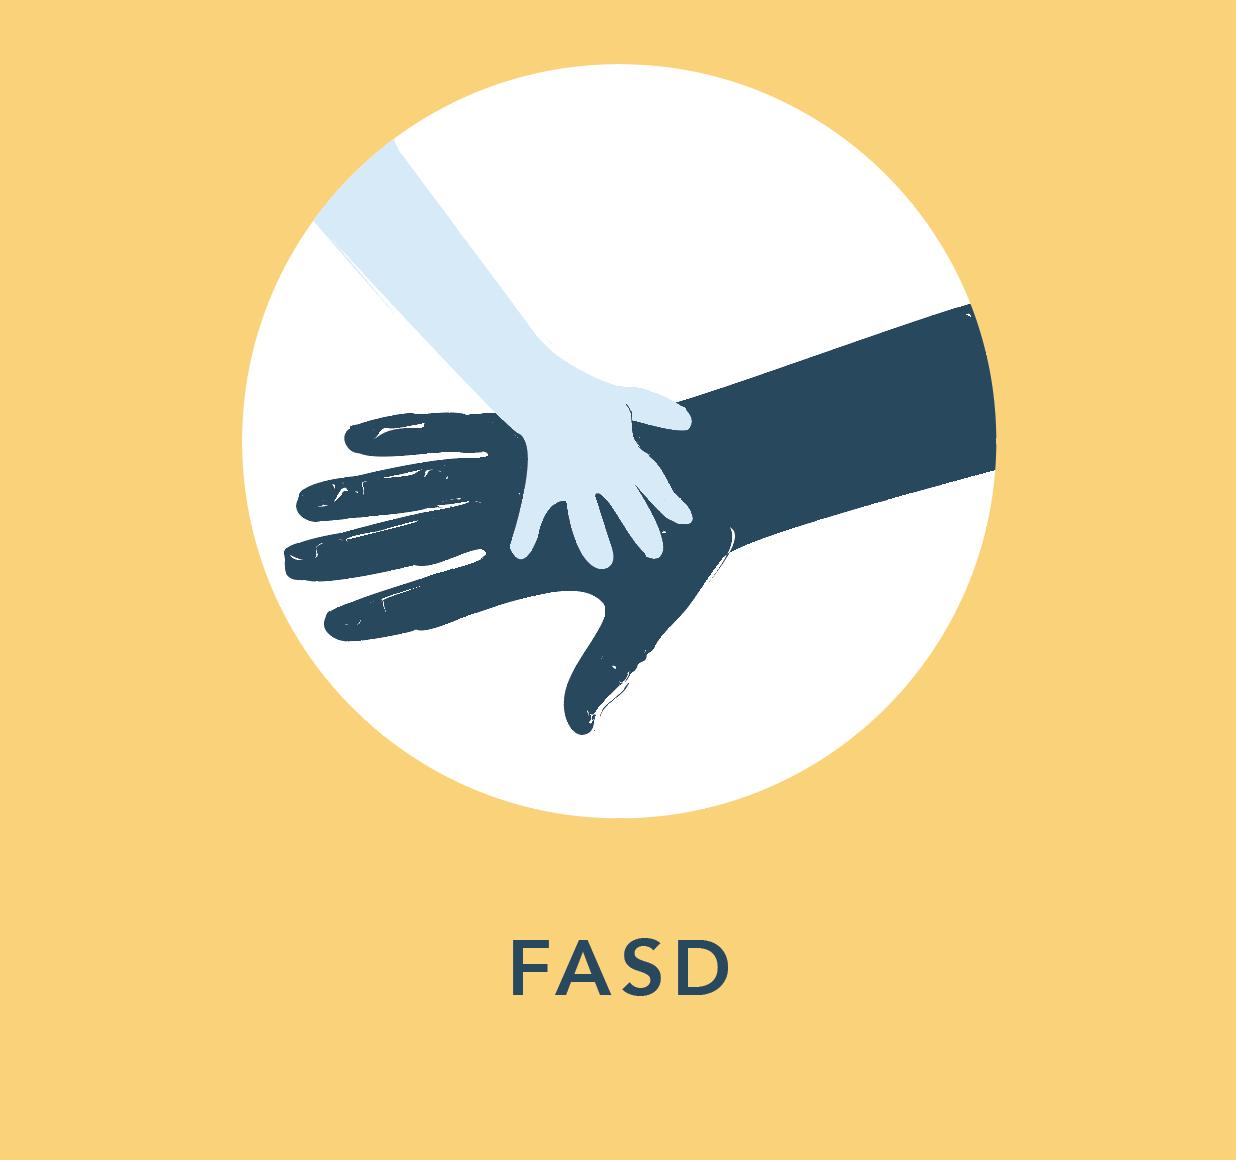 FASD_Adopt101.png